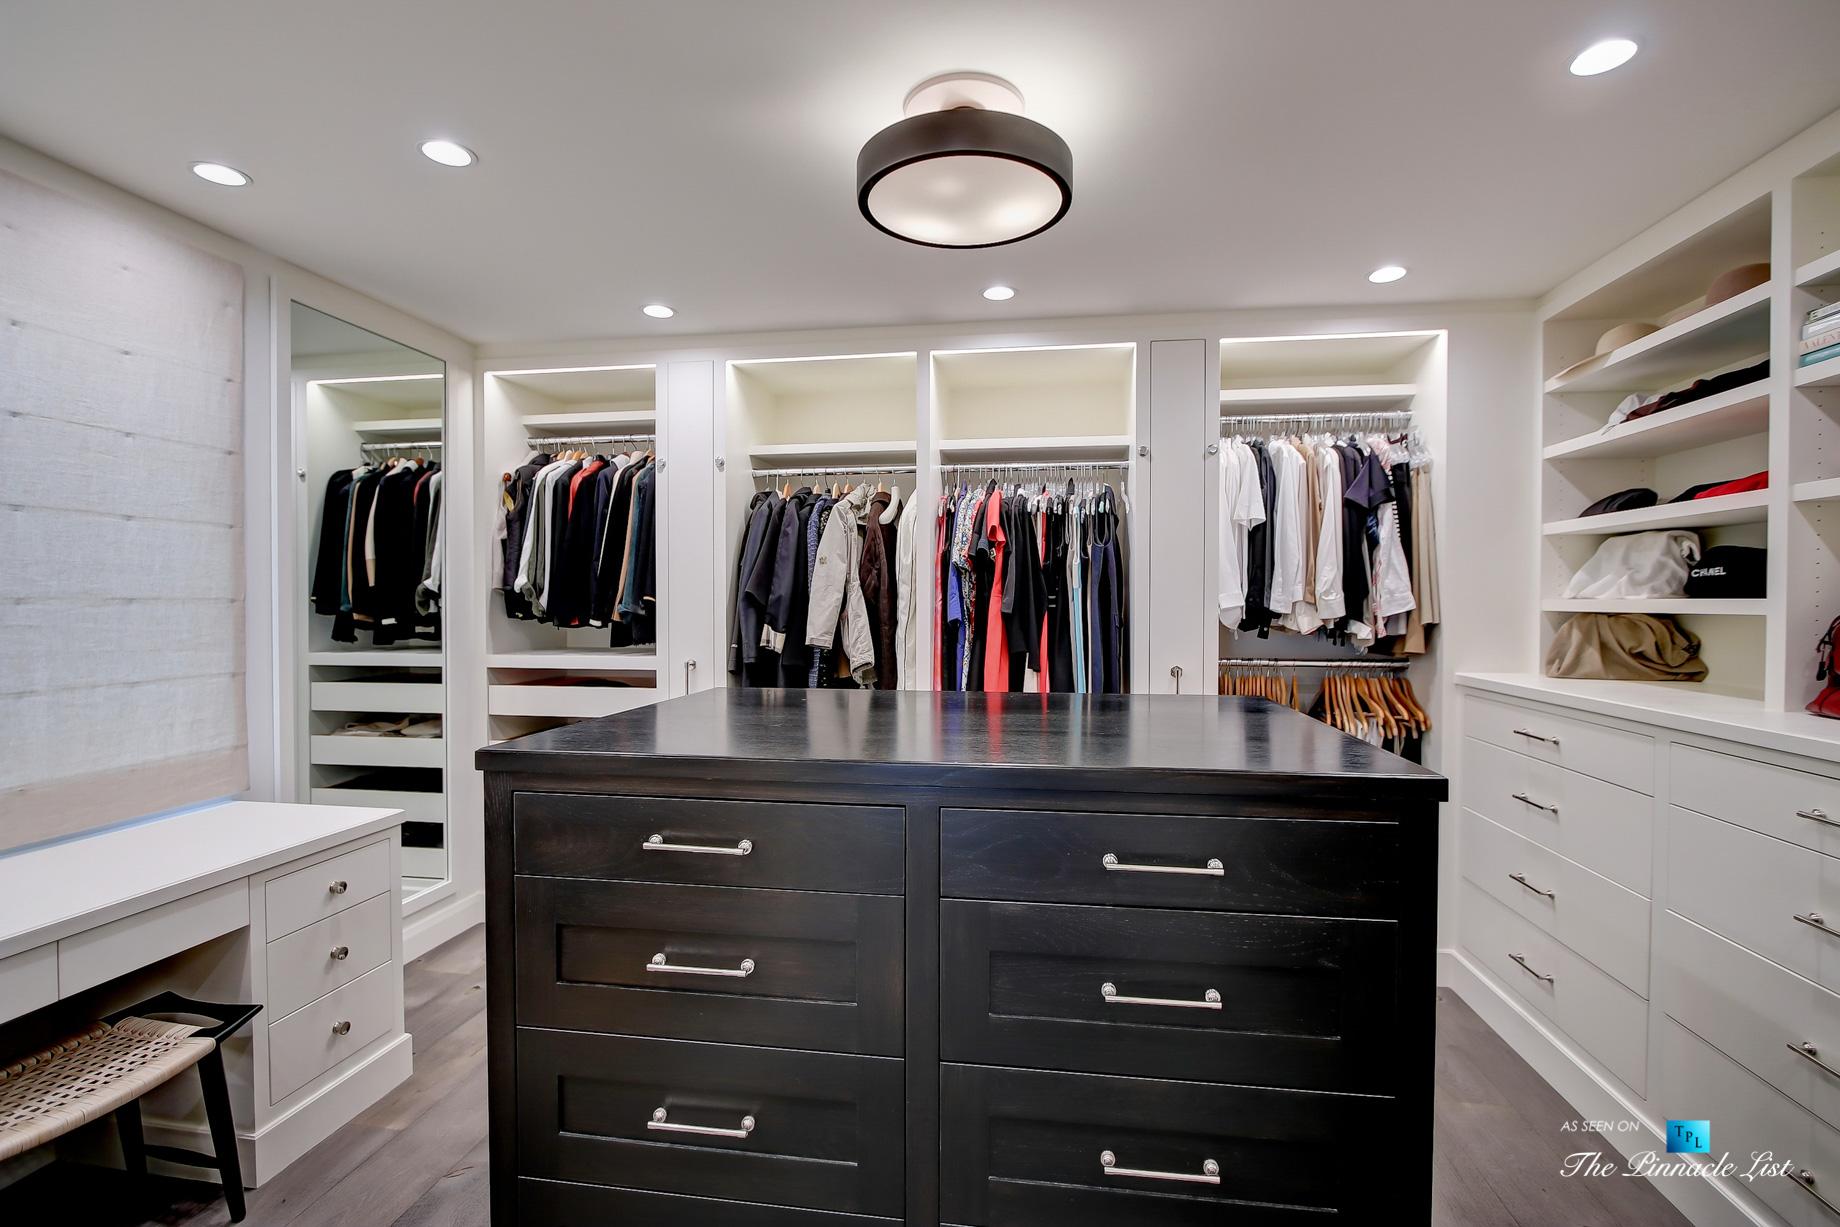 825 Highview Ave, Manhattan Beach, CA, USA - Master Bedroom Walk In Wardrobe Room - Luxury Real Estate - Modern Spanish Home